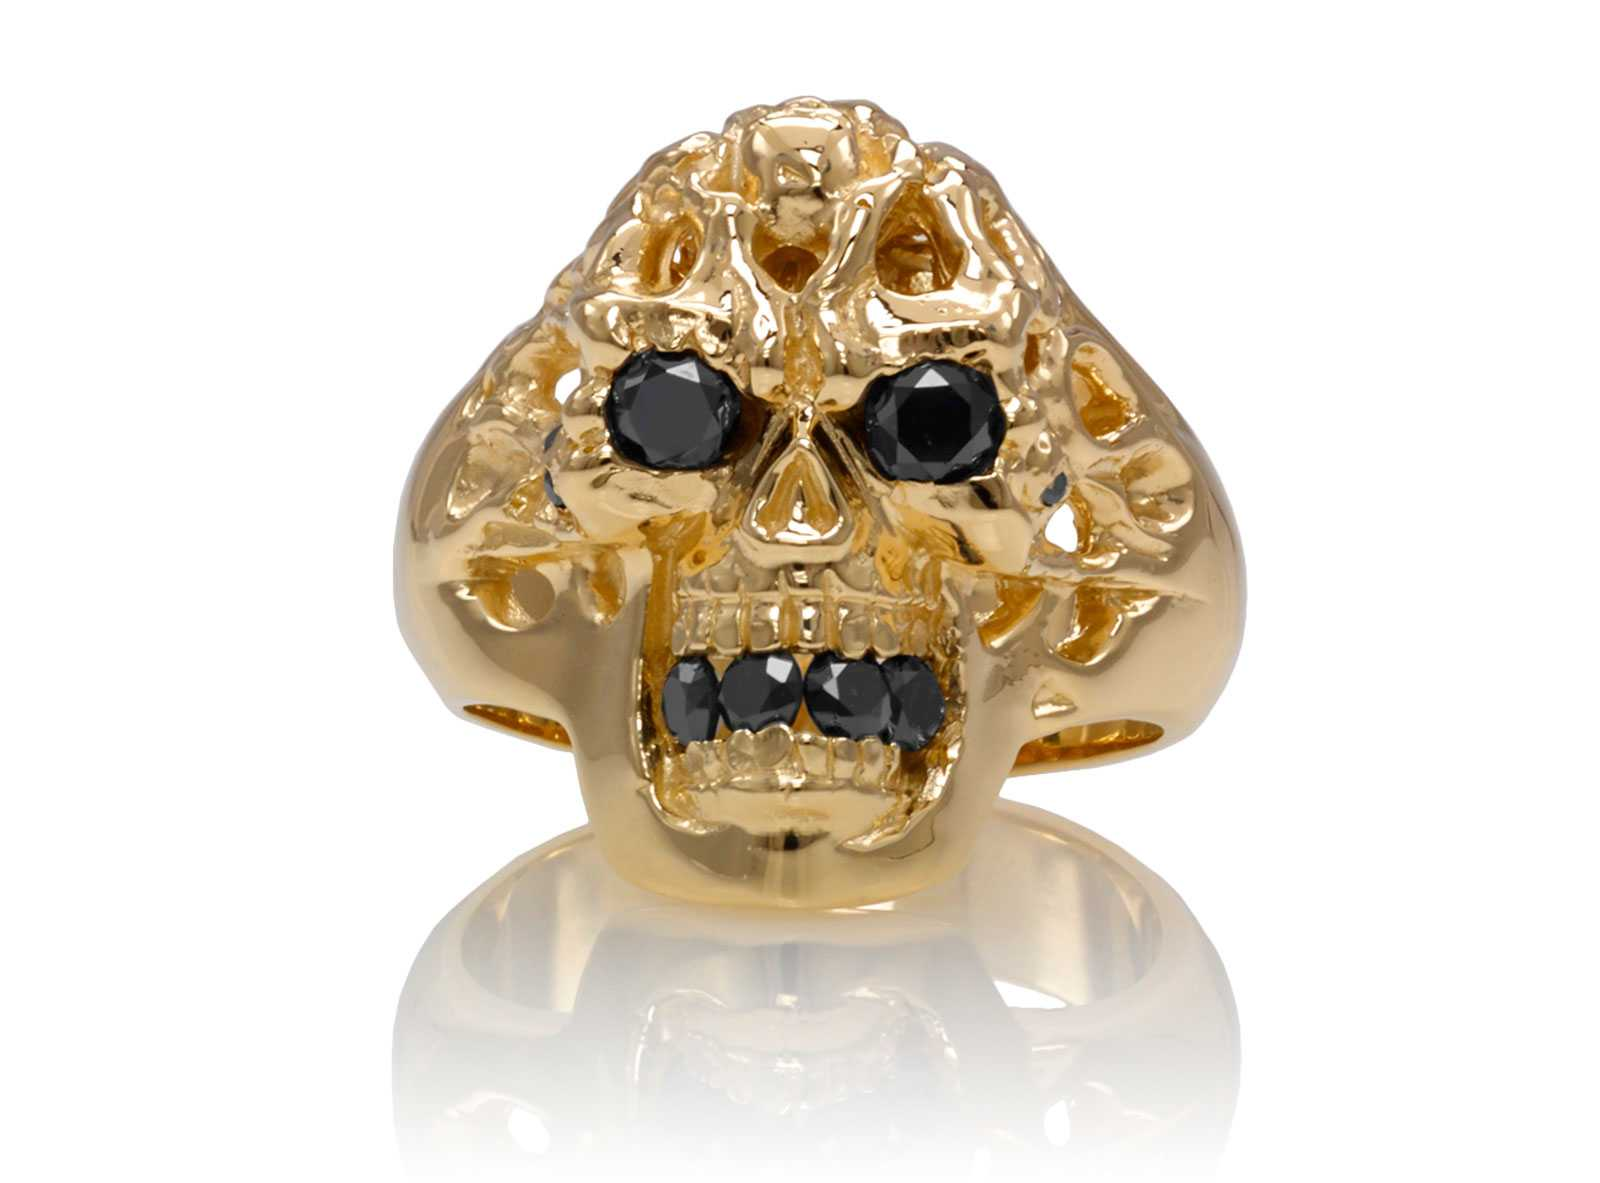 RG1140-A Brainiac skull ring Yellow Gold with Black Diamonds, designed by Steve Soffa